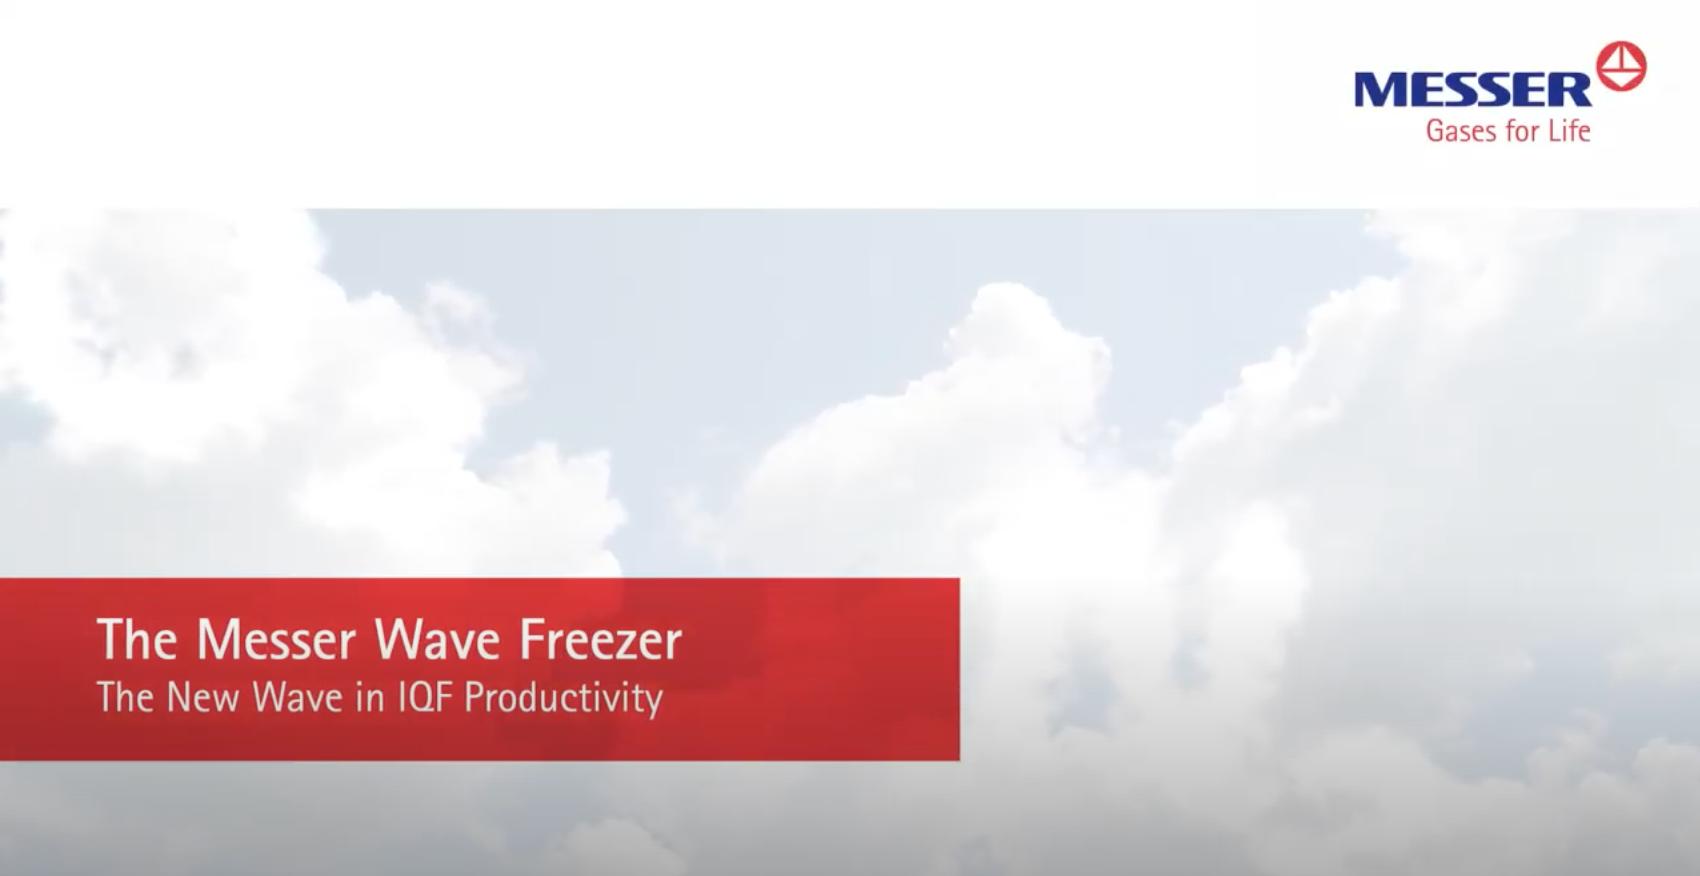 Messer's Wave Freezer